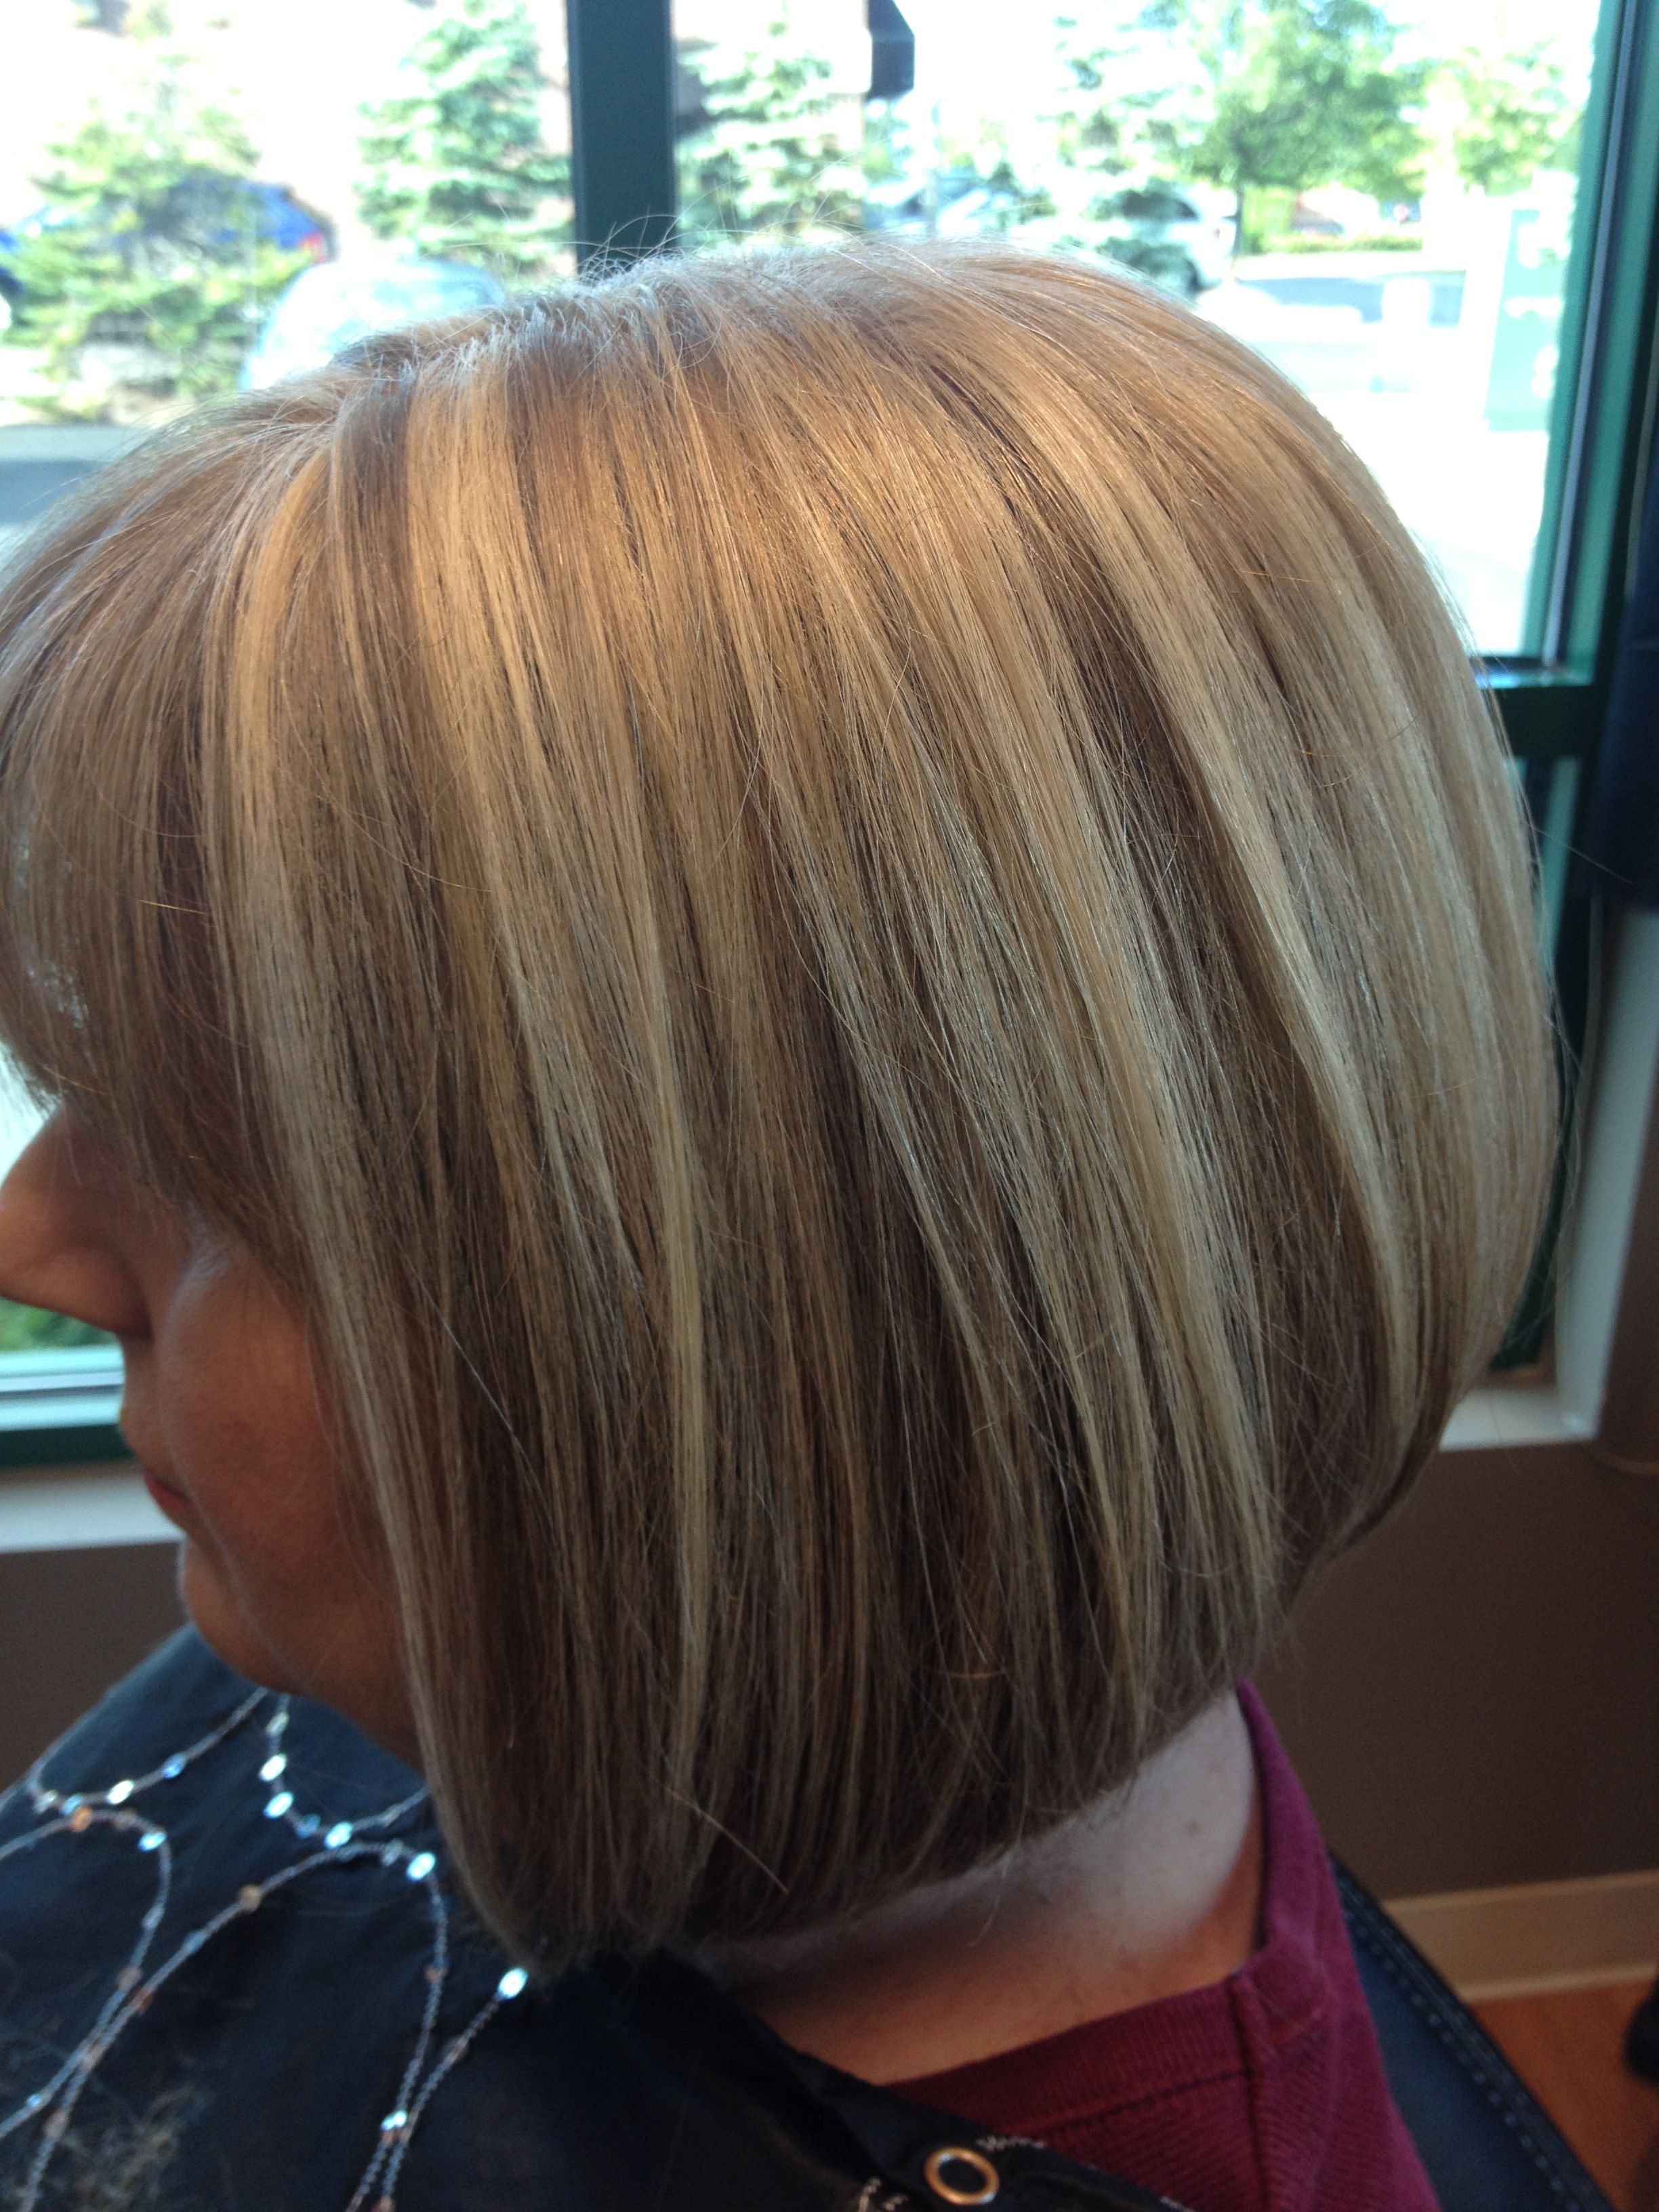 Blonde Highlights Bob Hairstyle Hair By Melissa Lobaito